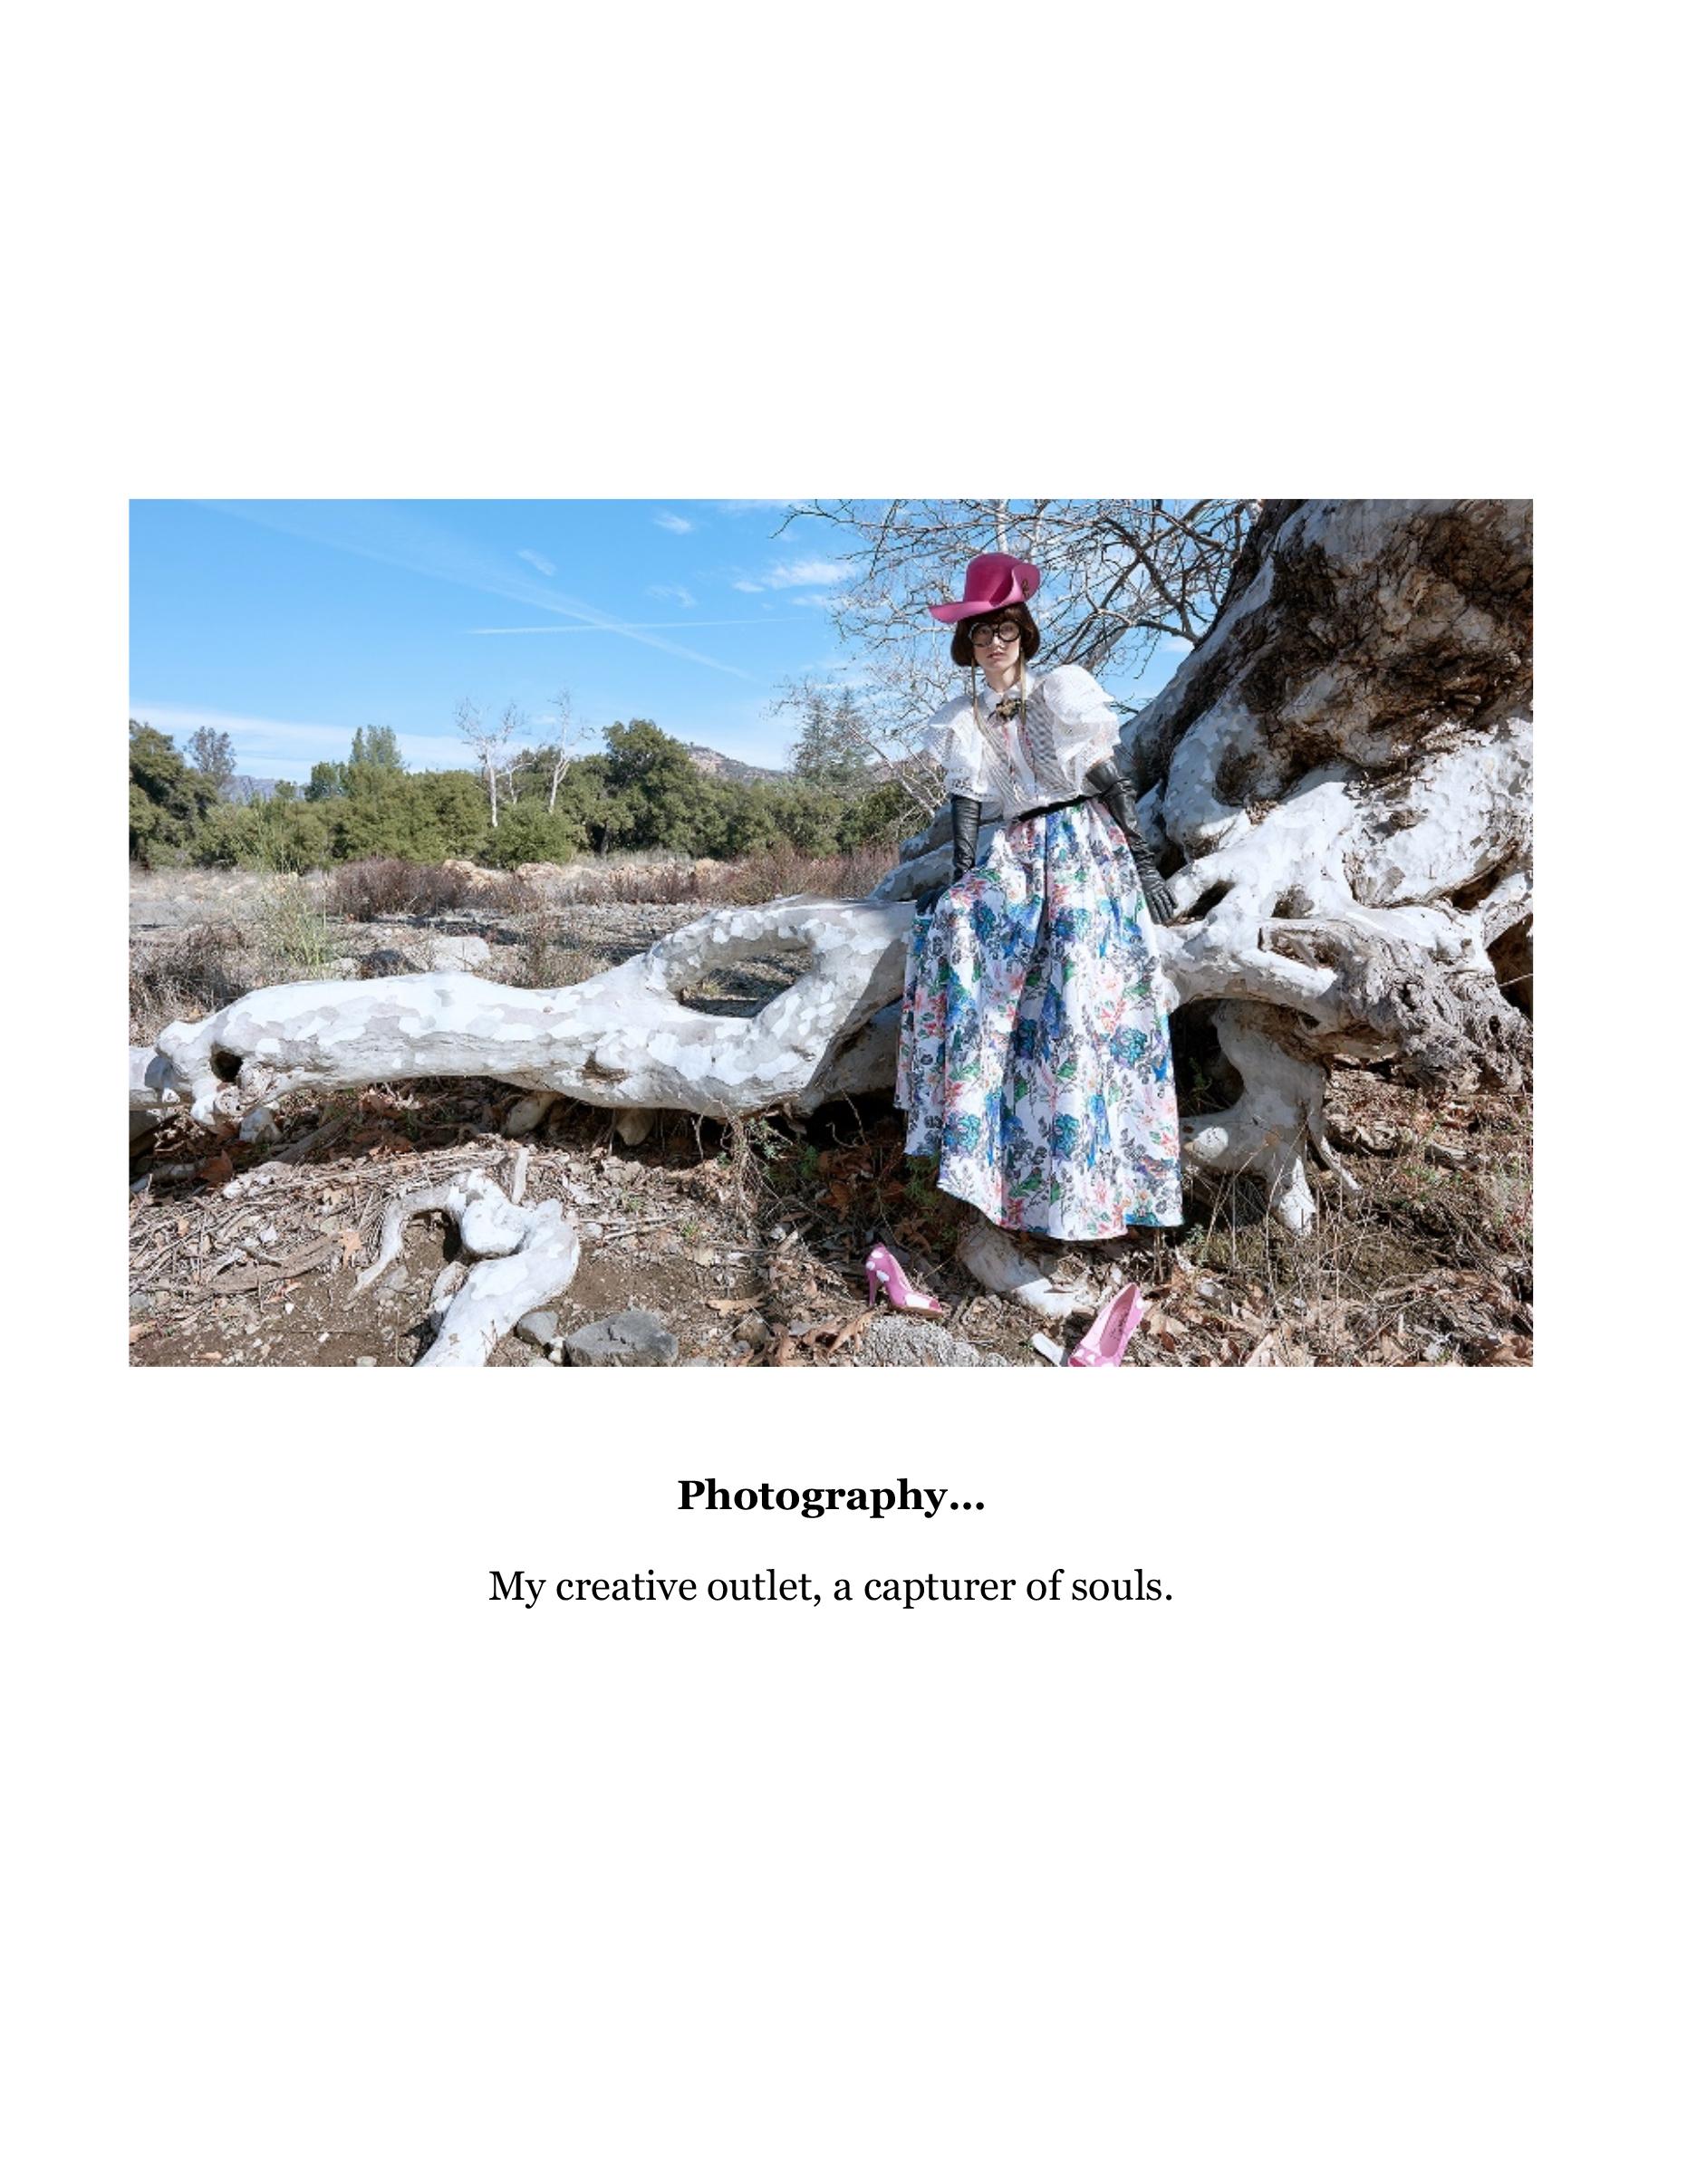 Daniella-Hehmann-Photography-Interview--backstyle-06.jpg